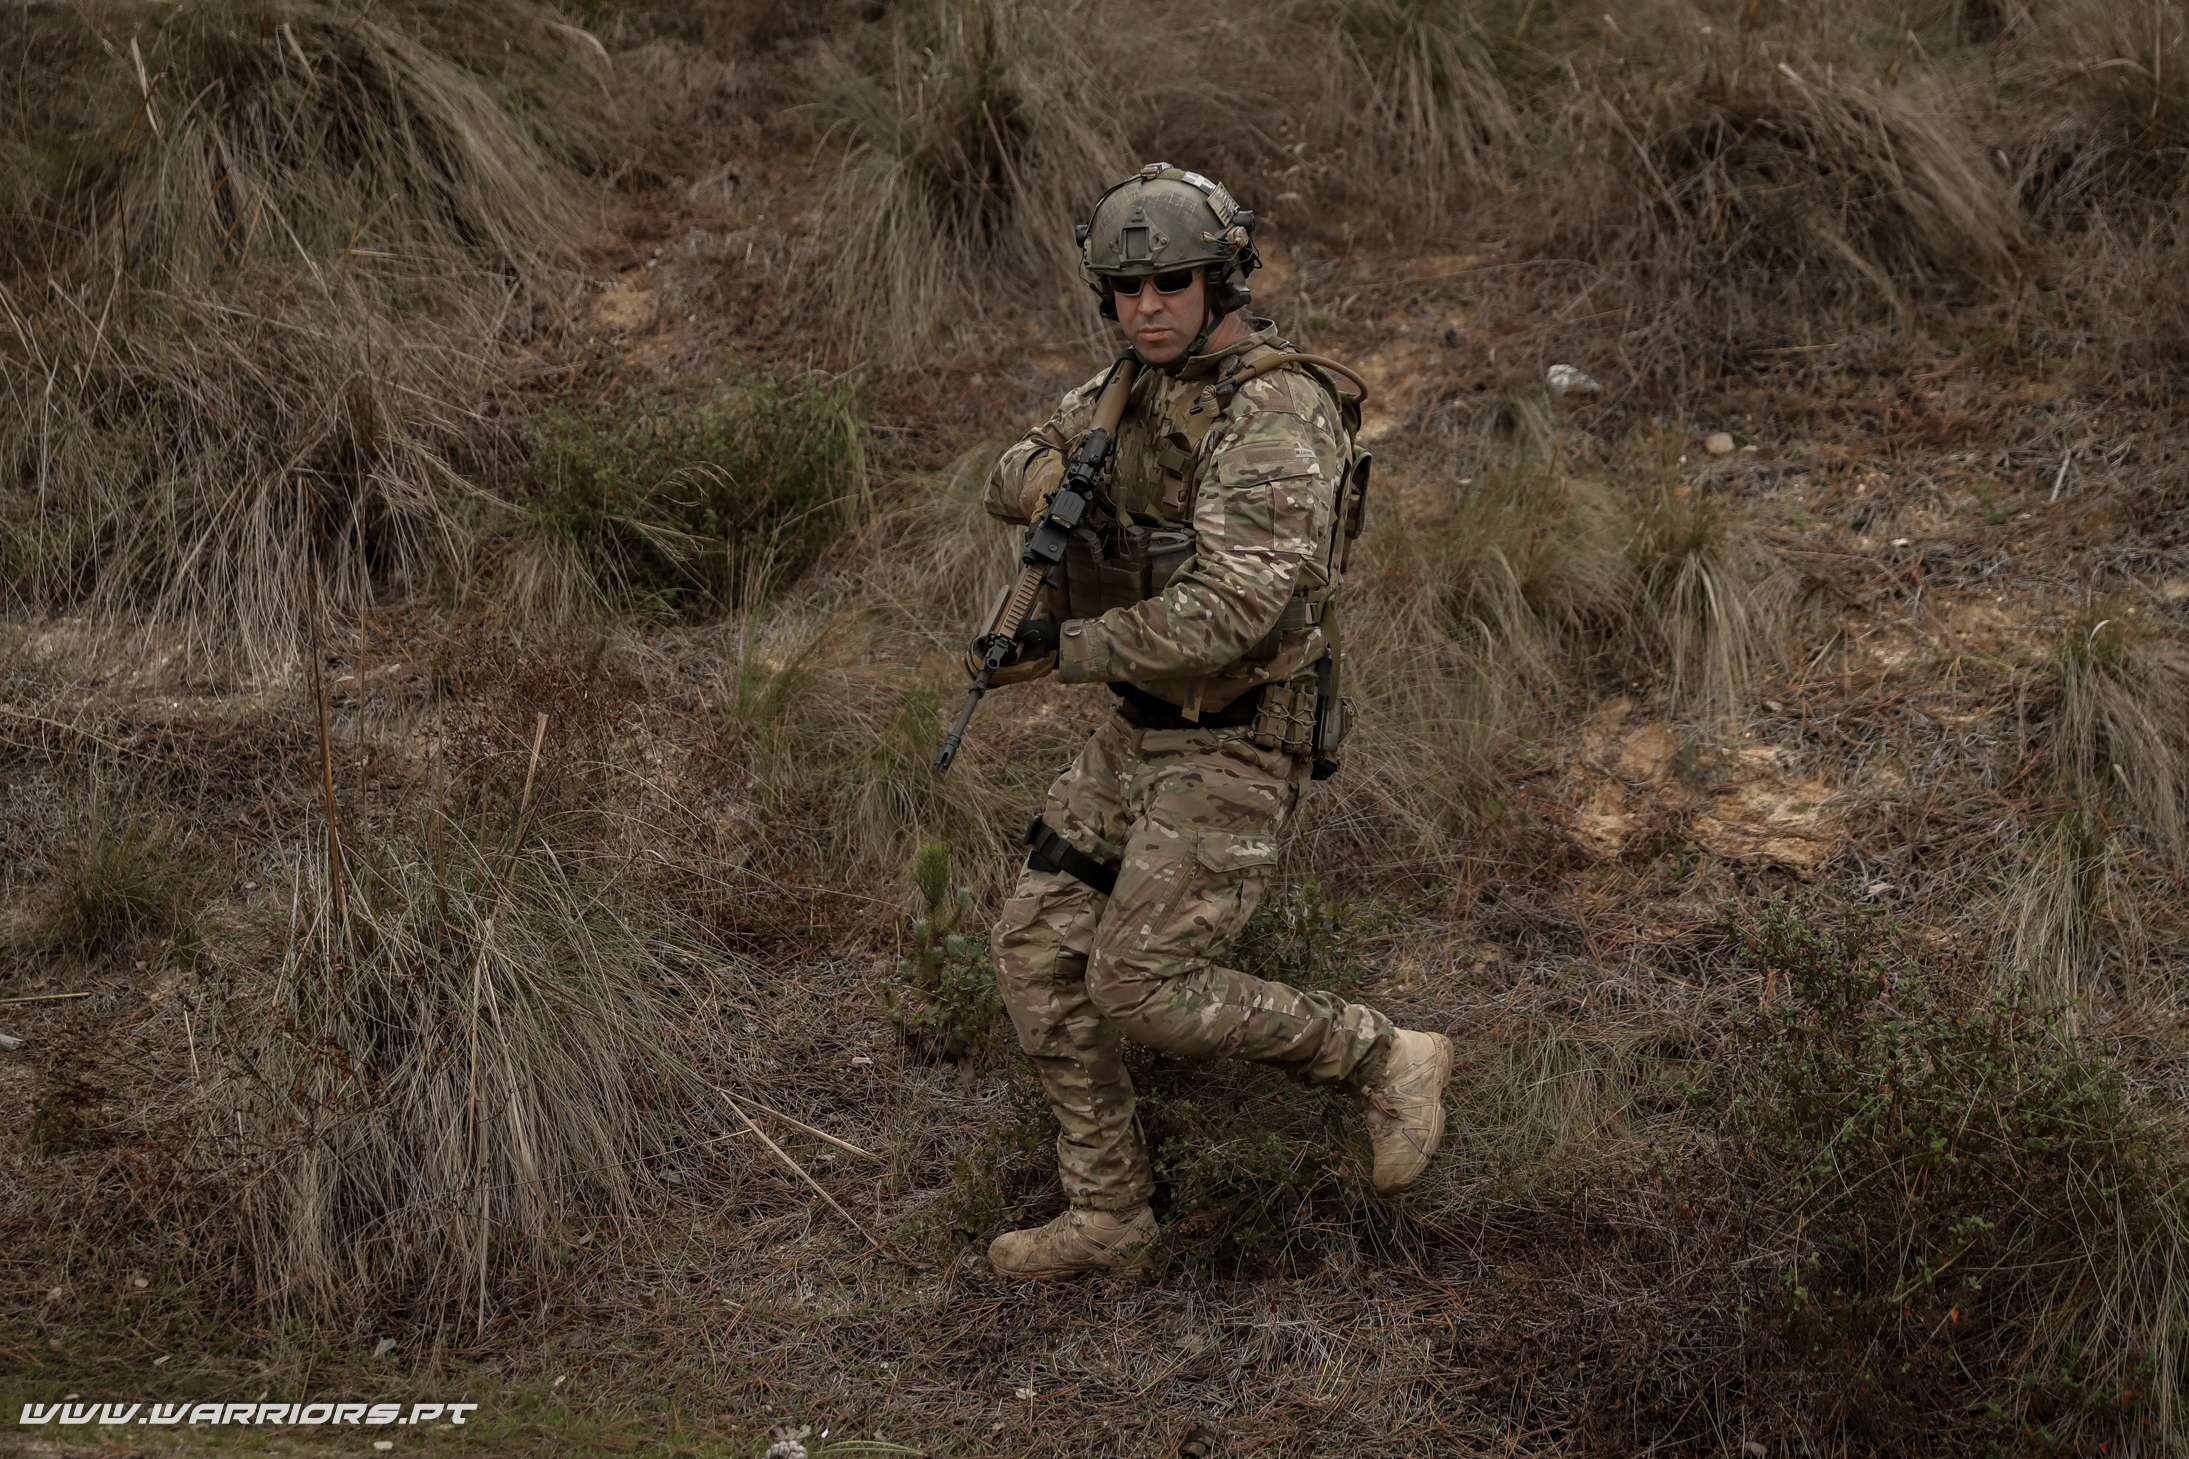 Substituição da G3 - Rangers Special Forces FN SCAR-L 5,56x45mm Meprolight M5